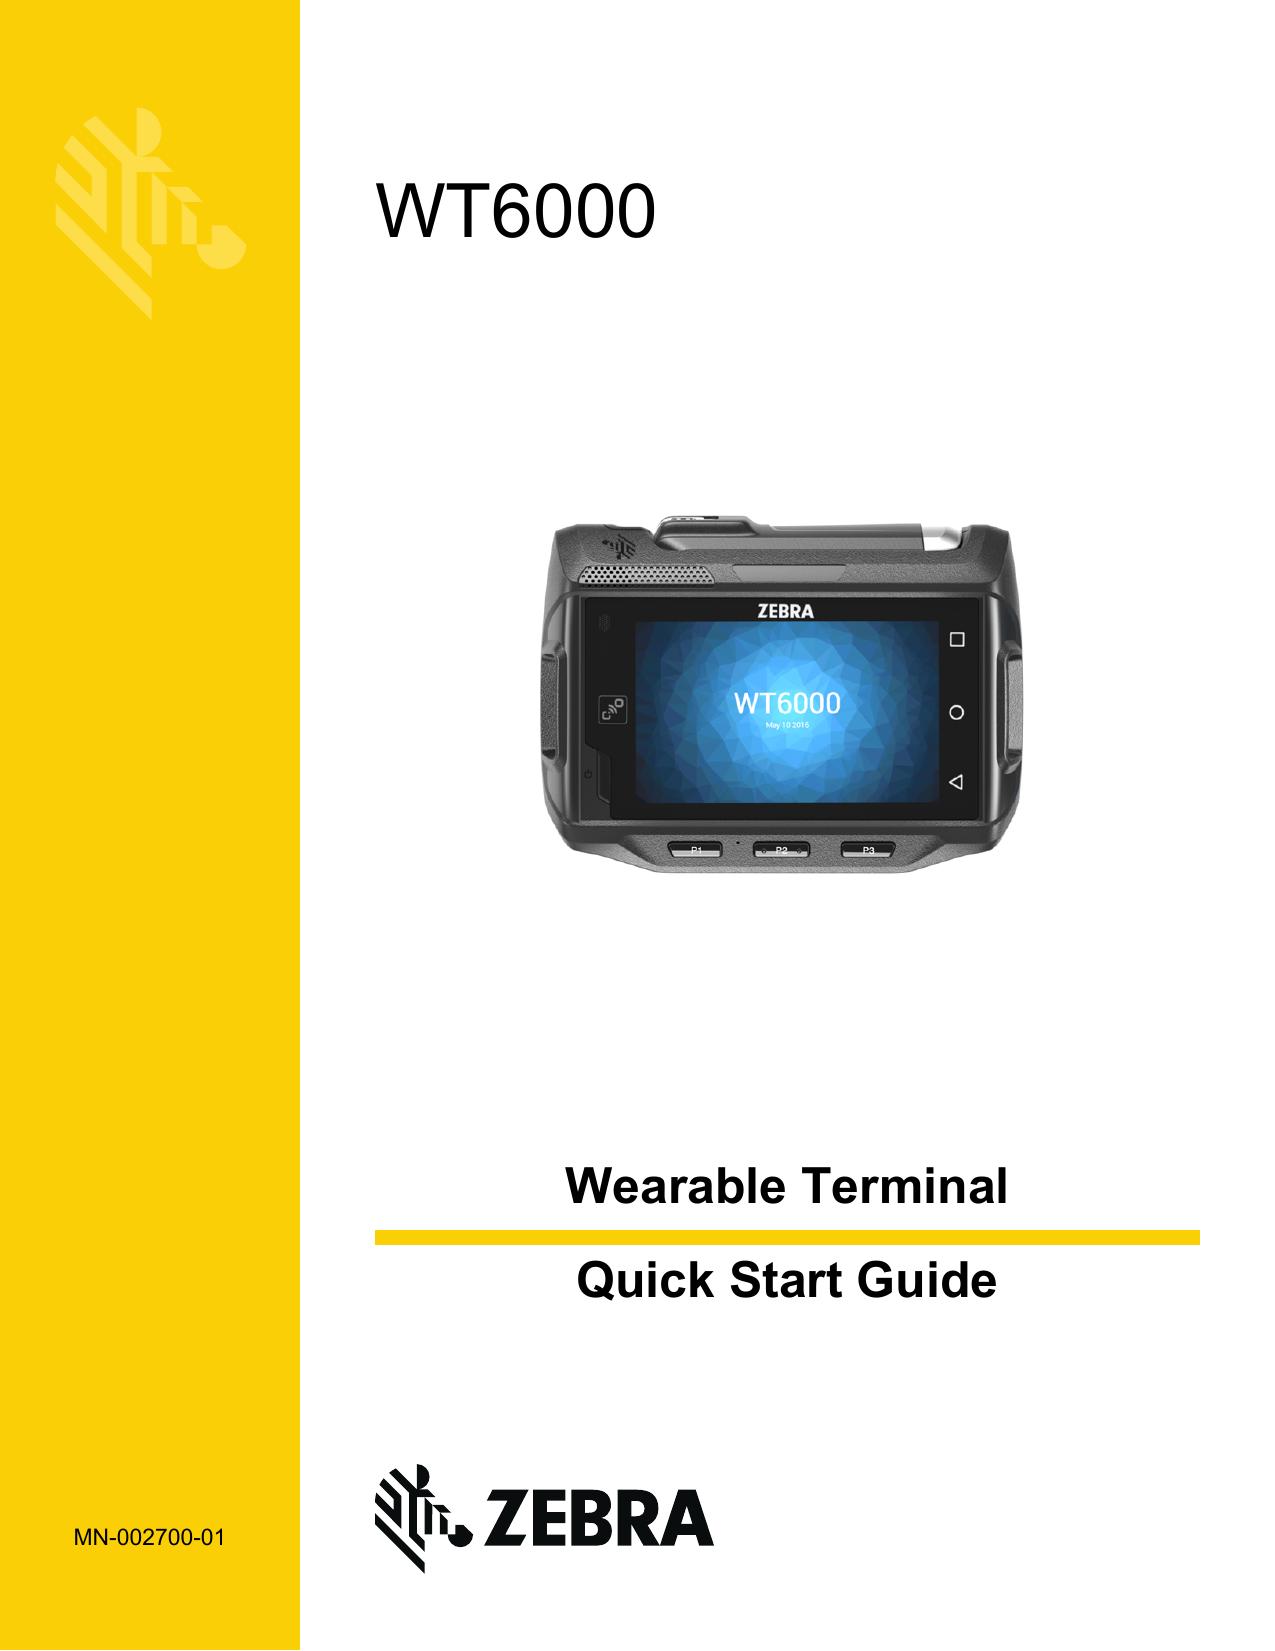 WT6000 - Strategic Mobility Group | manualzz com